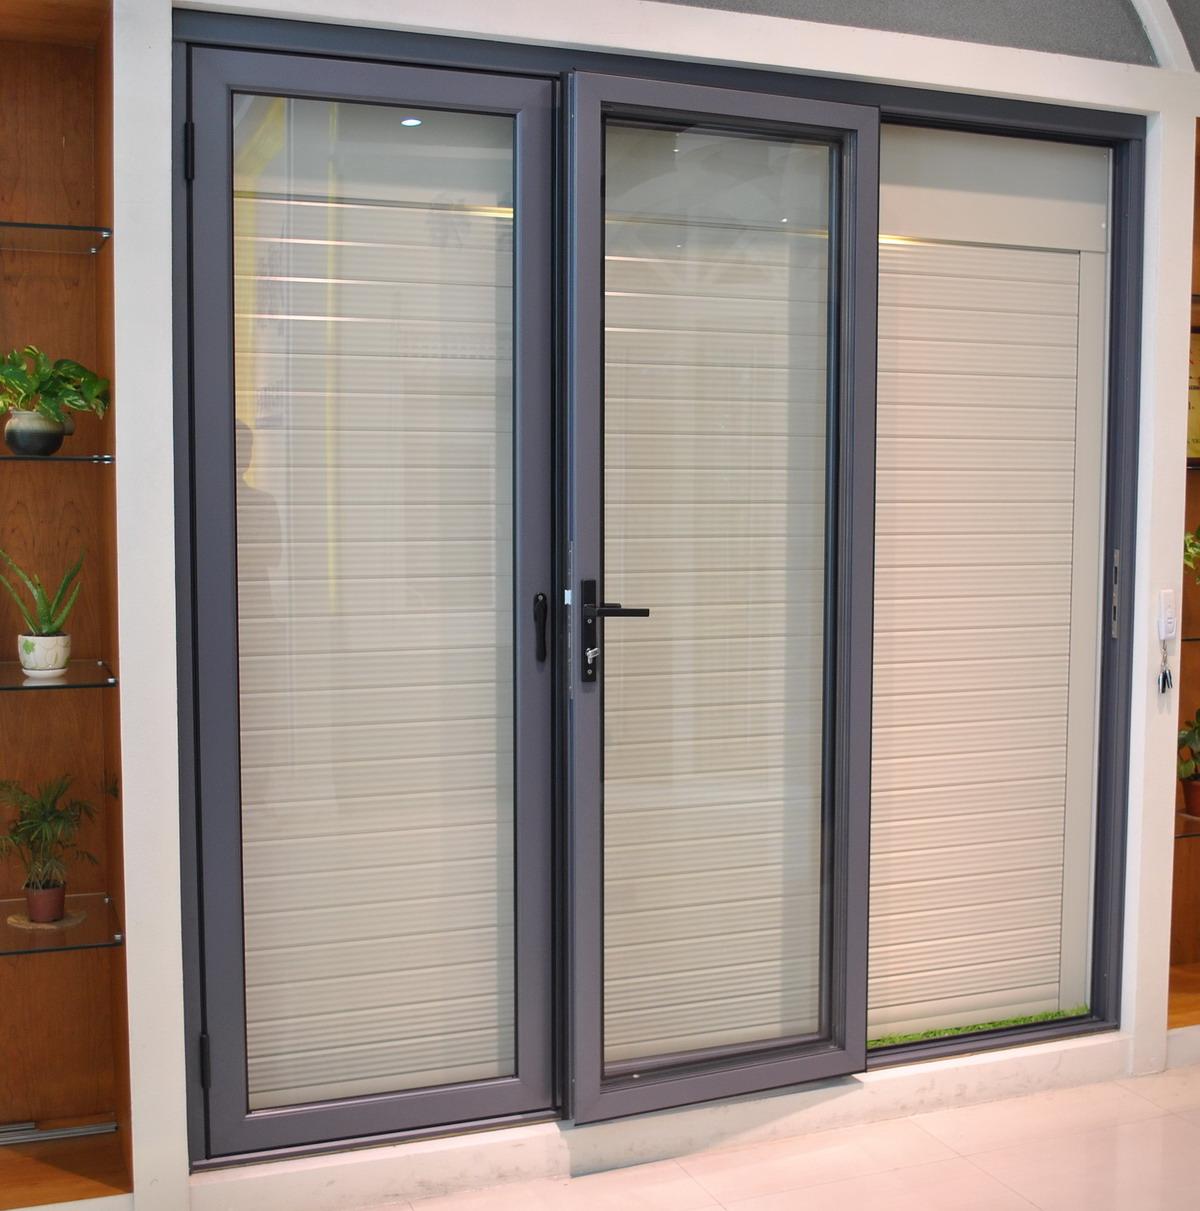 aluminium windows and doors used